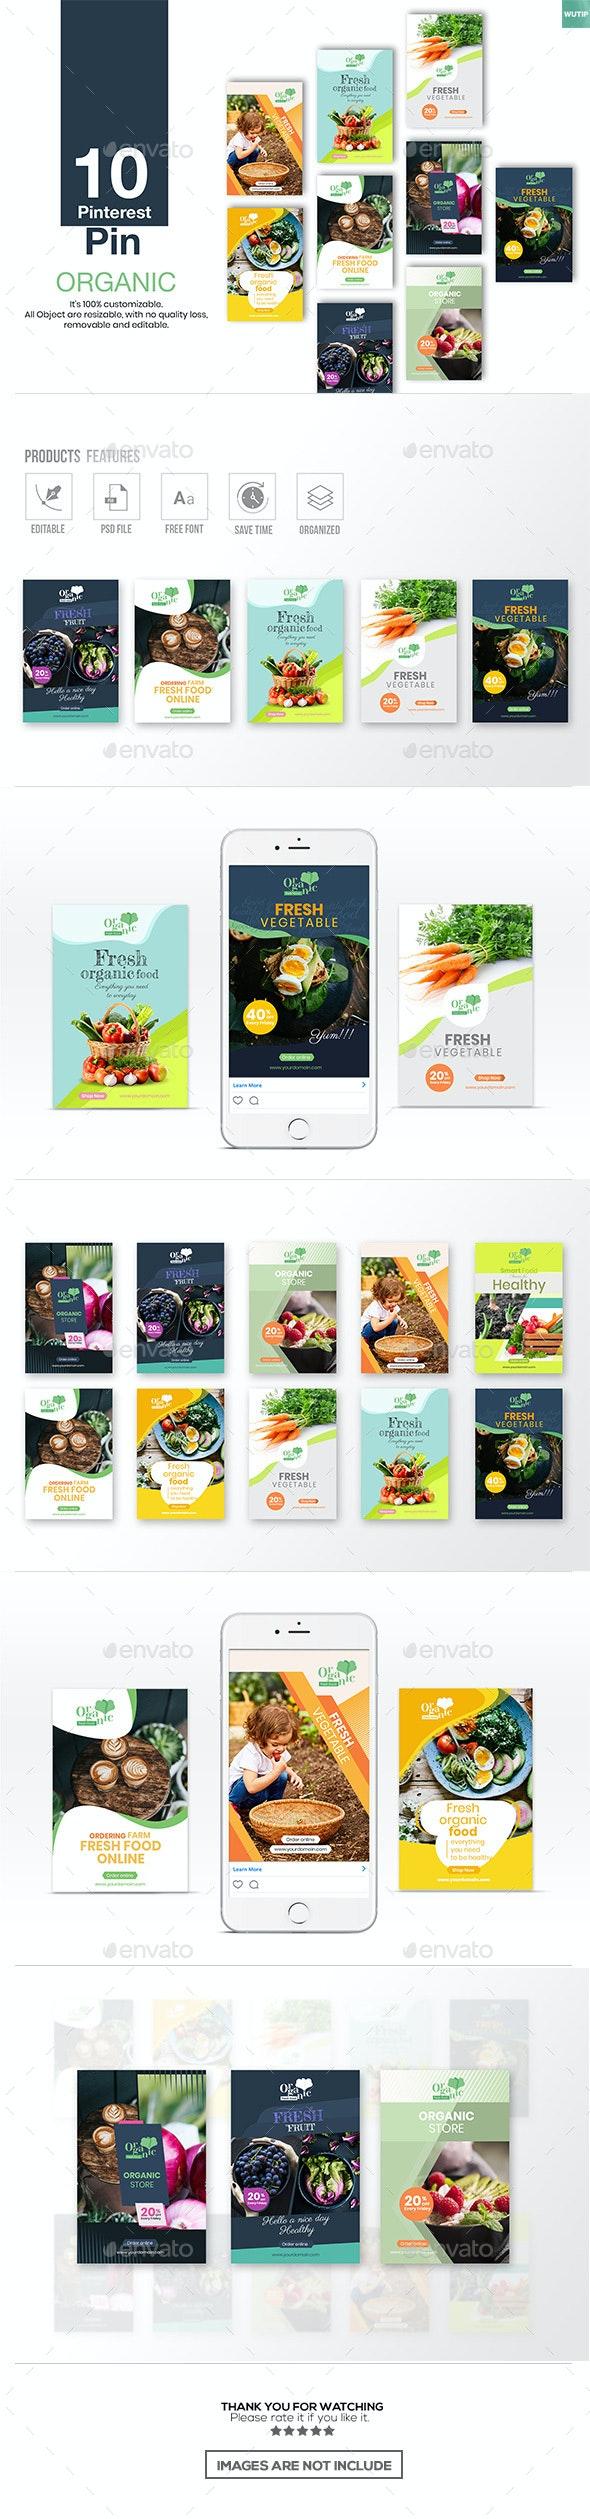 10 Pinterest Pin Banner - Organic - Miscellaneous Social Media